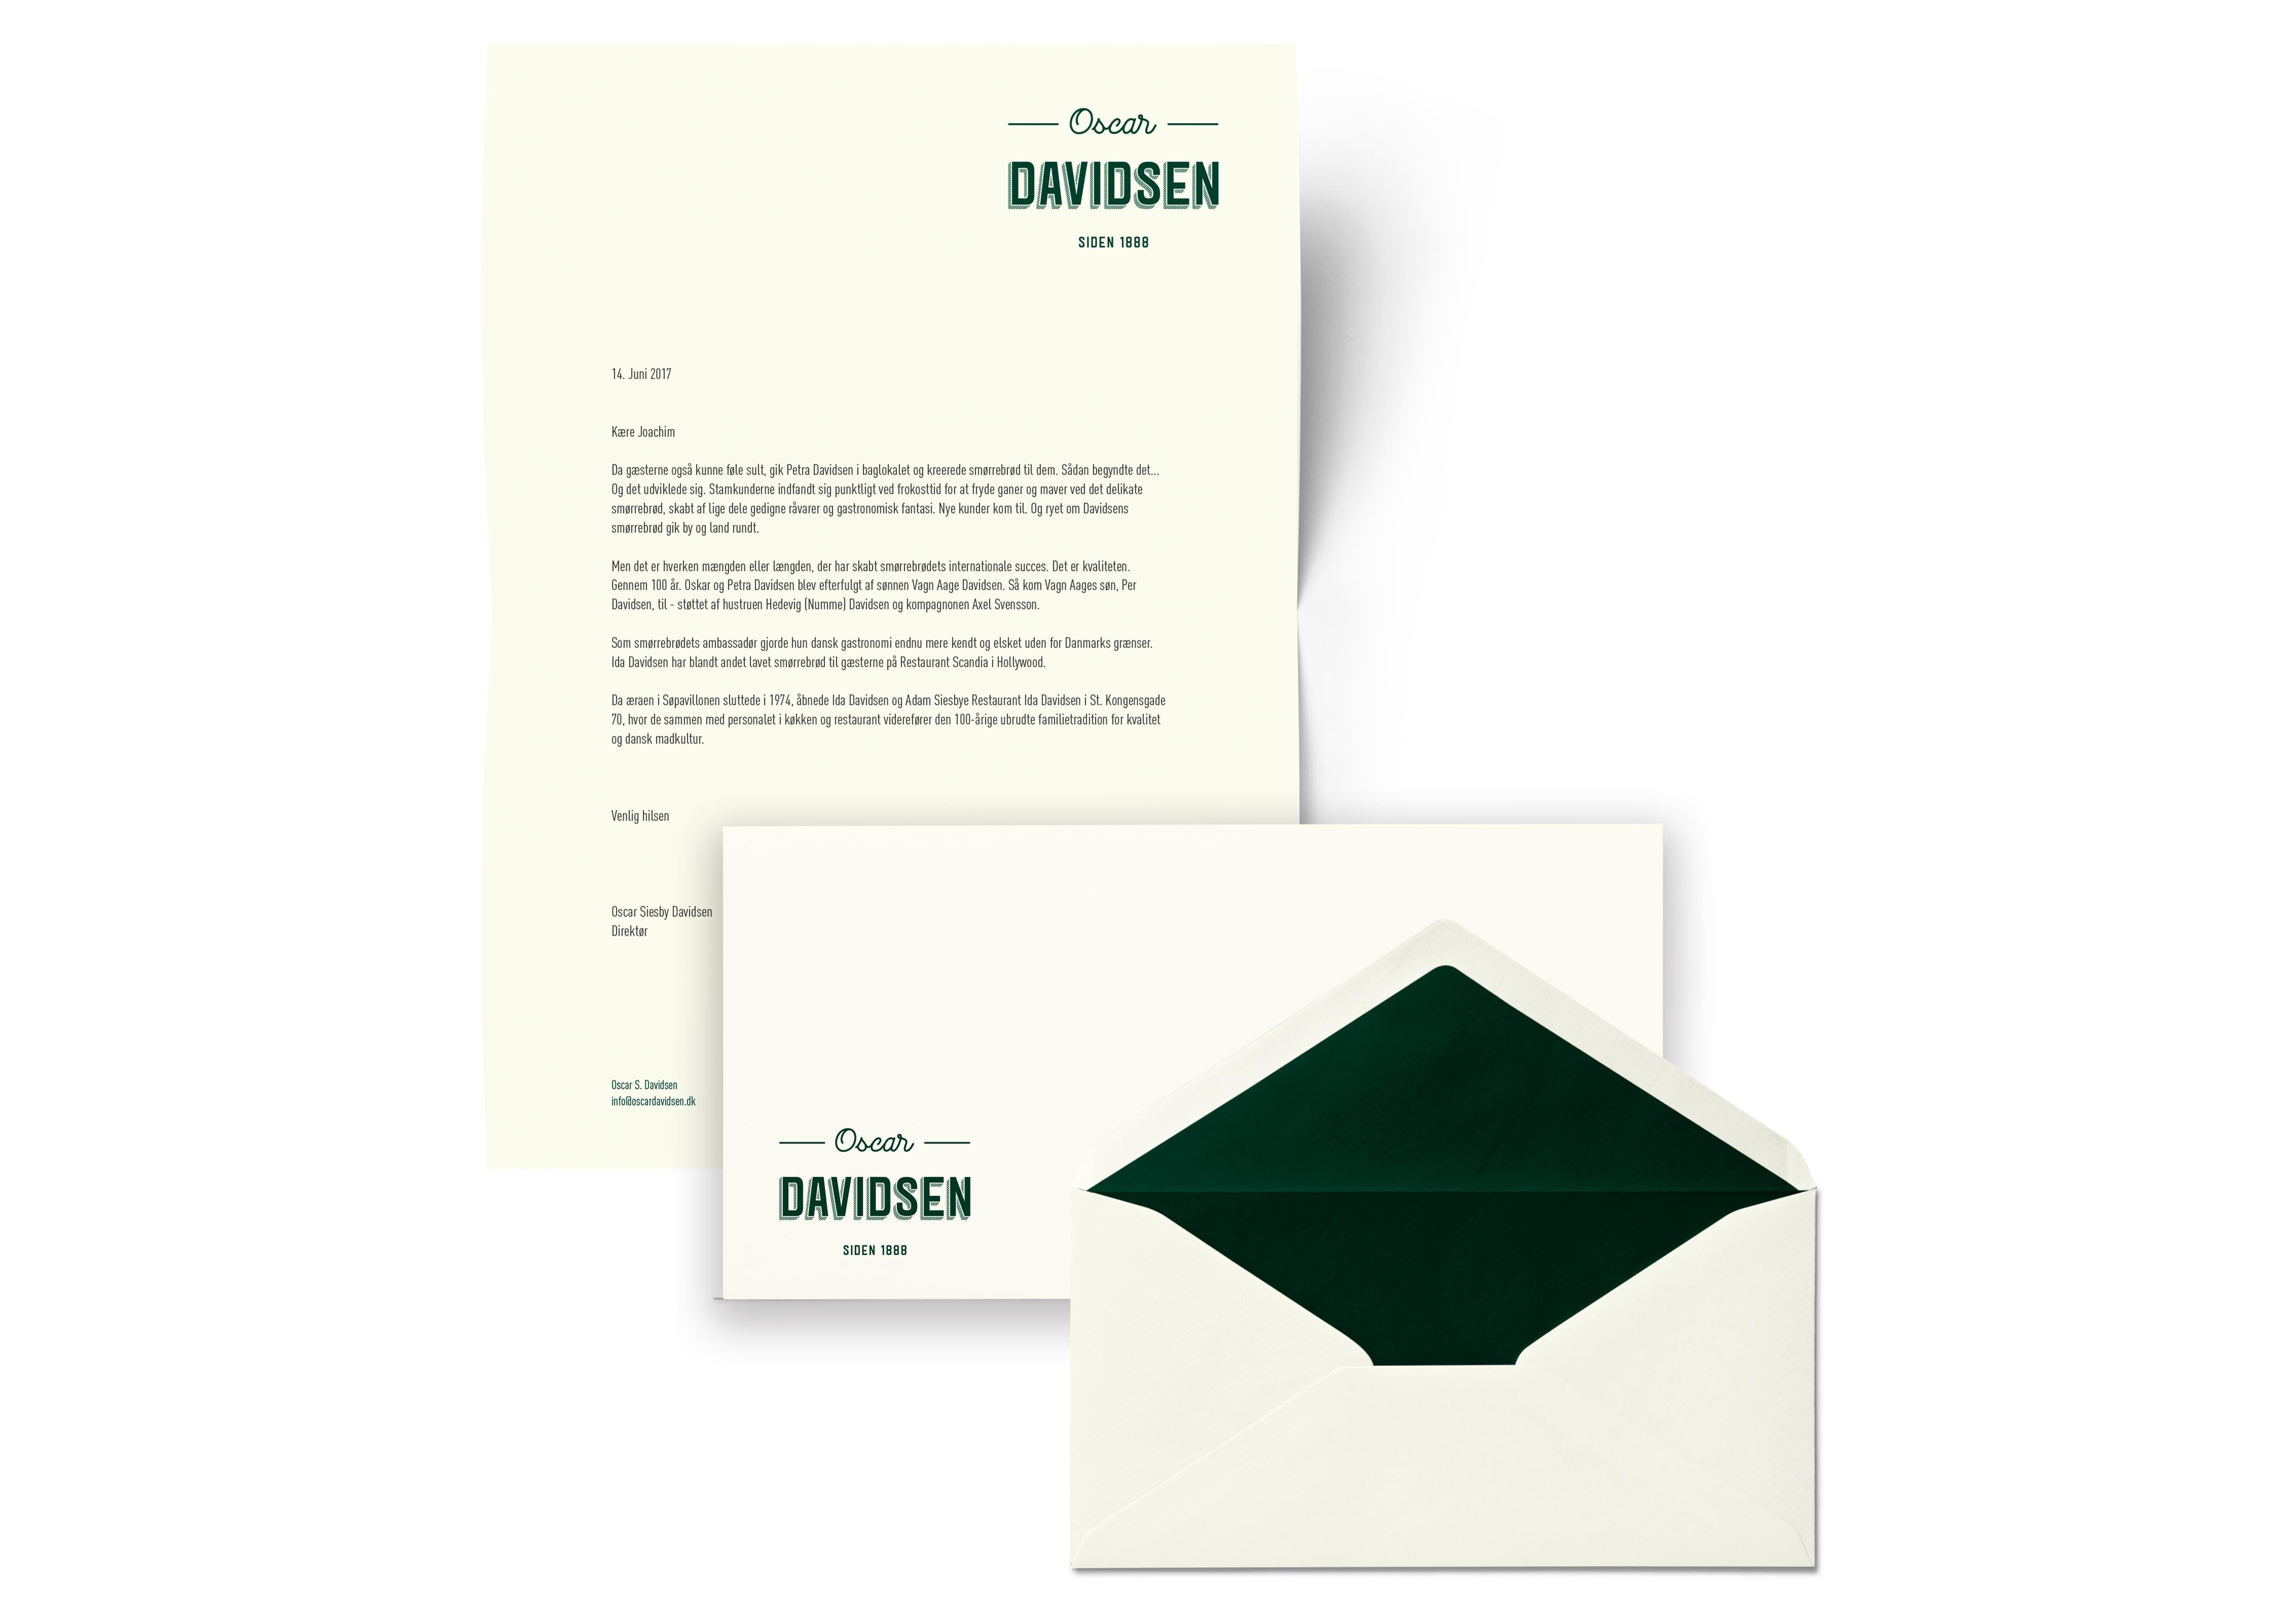 envelope_philipjohansen_idadavidsen